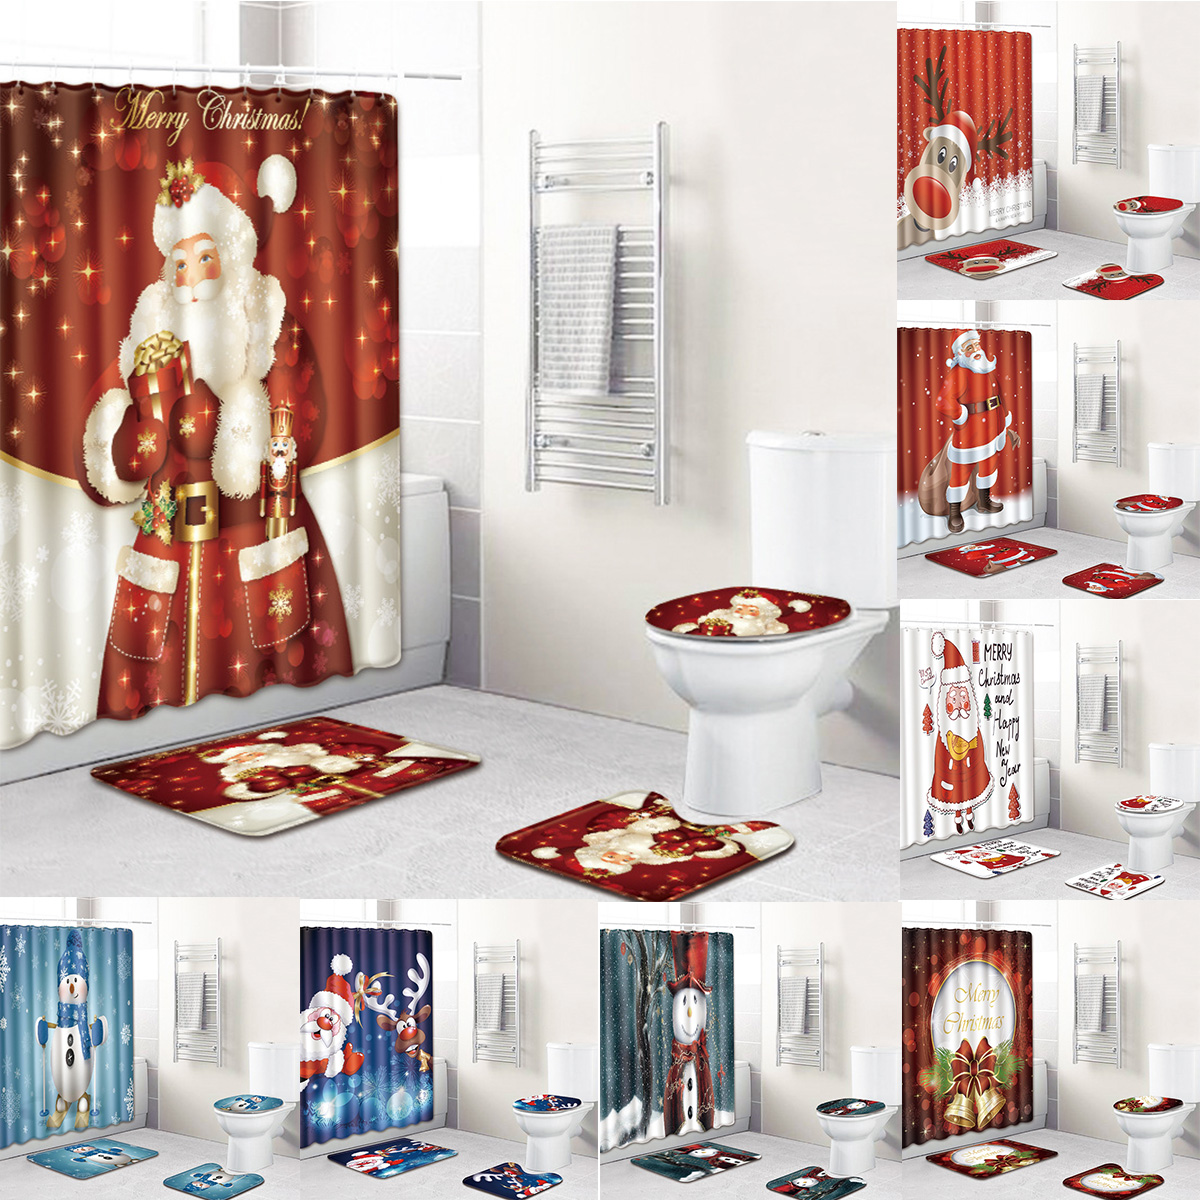 Christmas Reindeer And Sleigh Waterproof Fabric Bathroom Shower Curtain 71Inch